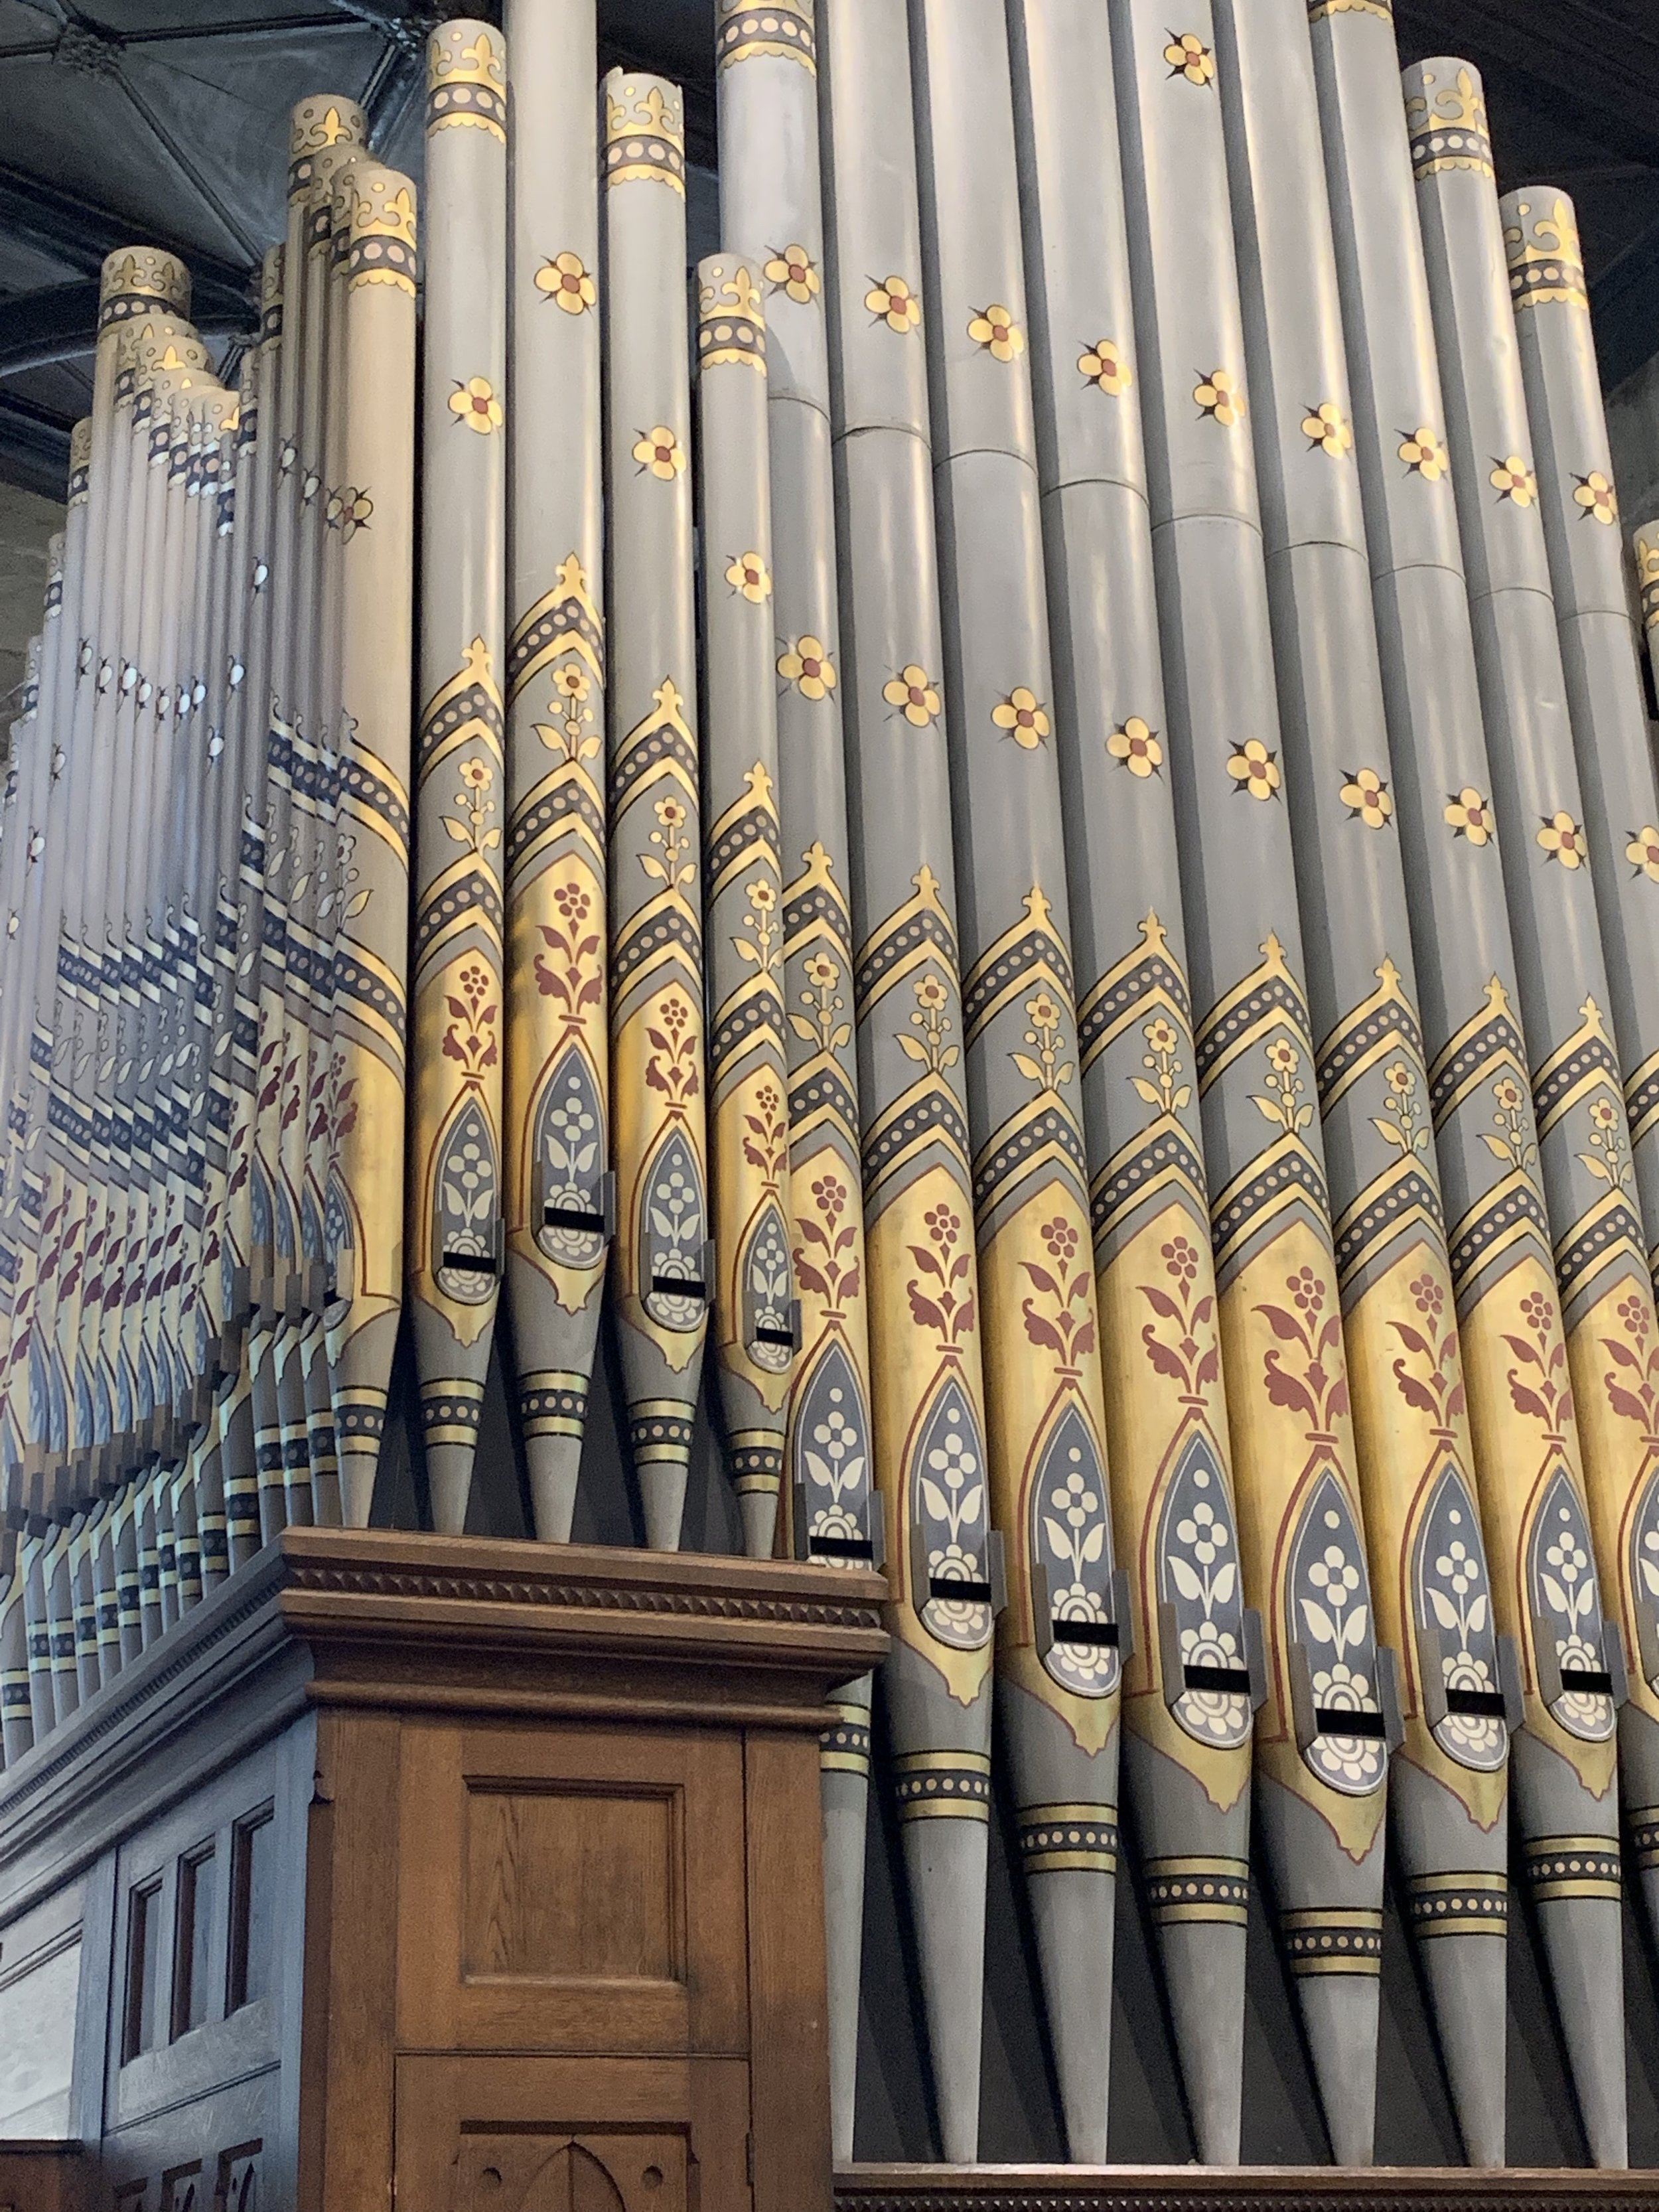 Organ pipes at St Giles' Parish Church, Wrexam, Wales. Photo by anne richardson